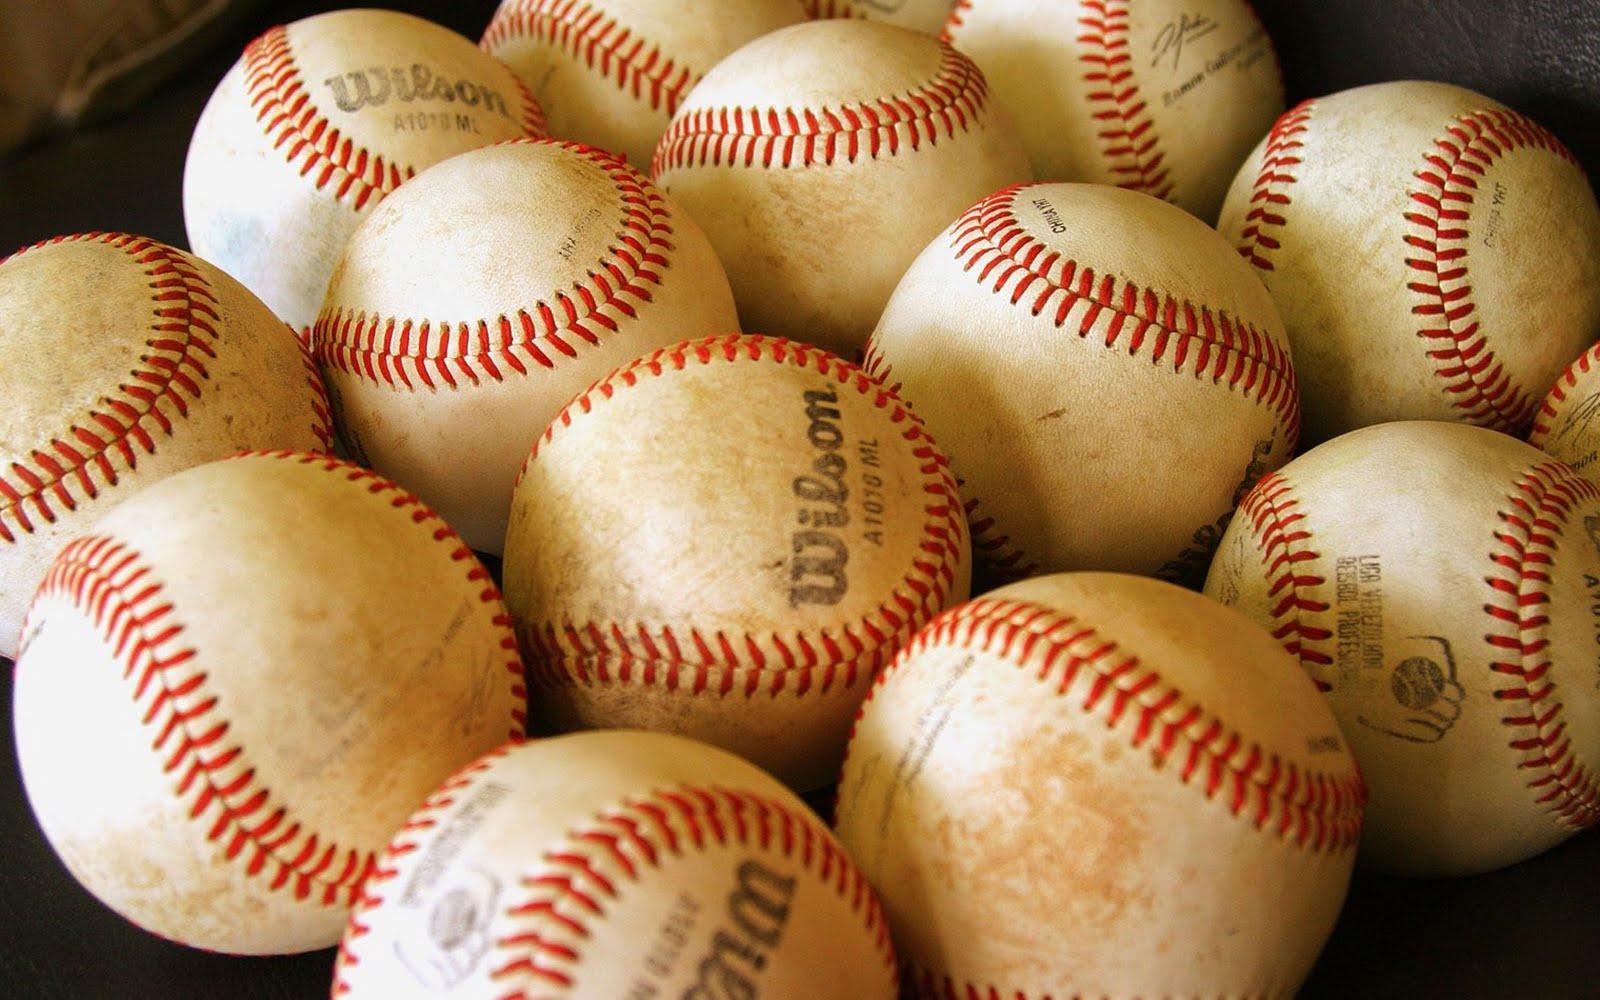 http://3.bp.blogspot.com/-TYPZTtq1EuY/TmpmS0sE3aI/AAAAAAAAEV8/CeS1AAELHJg/s1600/Hd+baseball+wallpapers+4.jpg